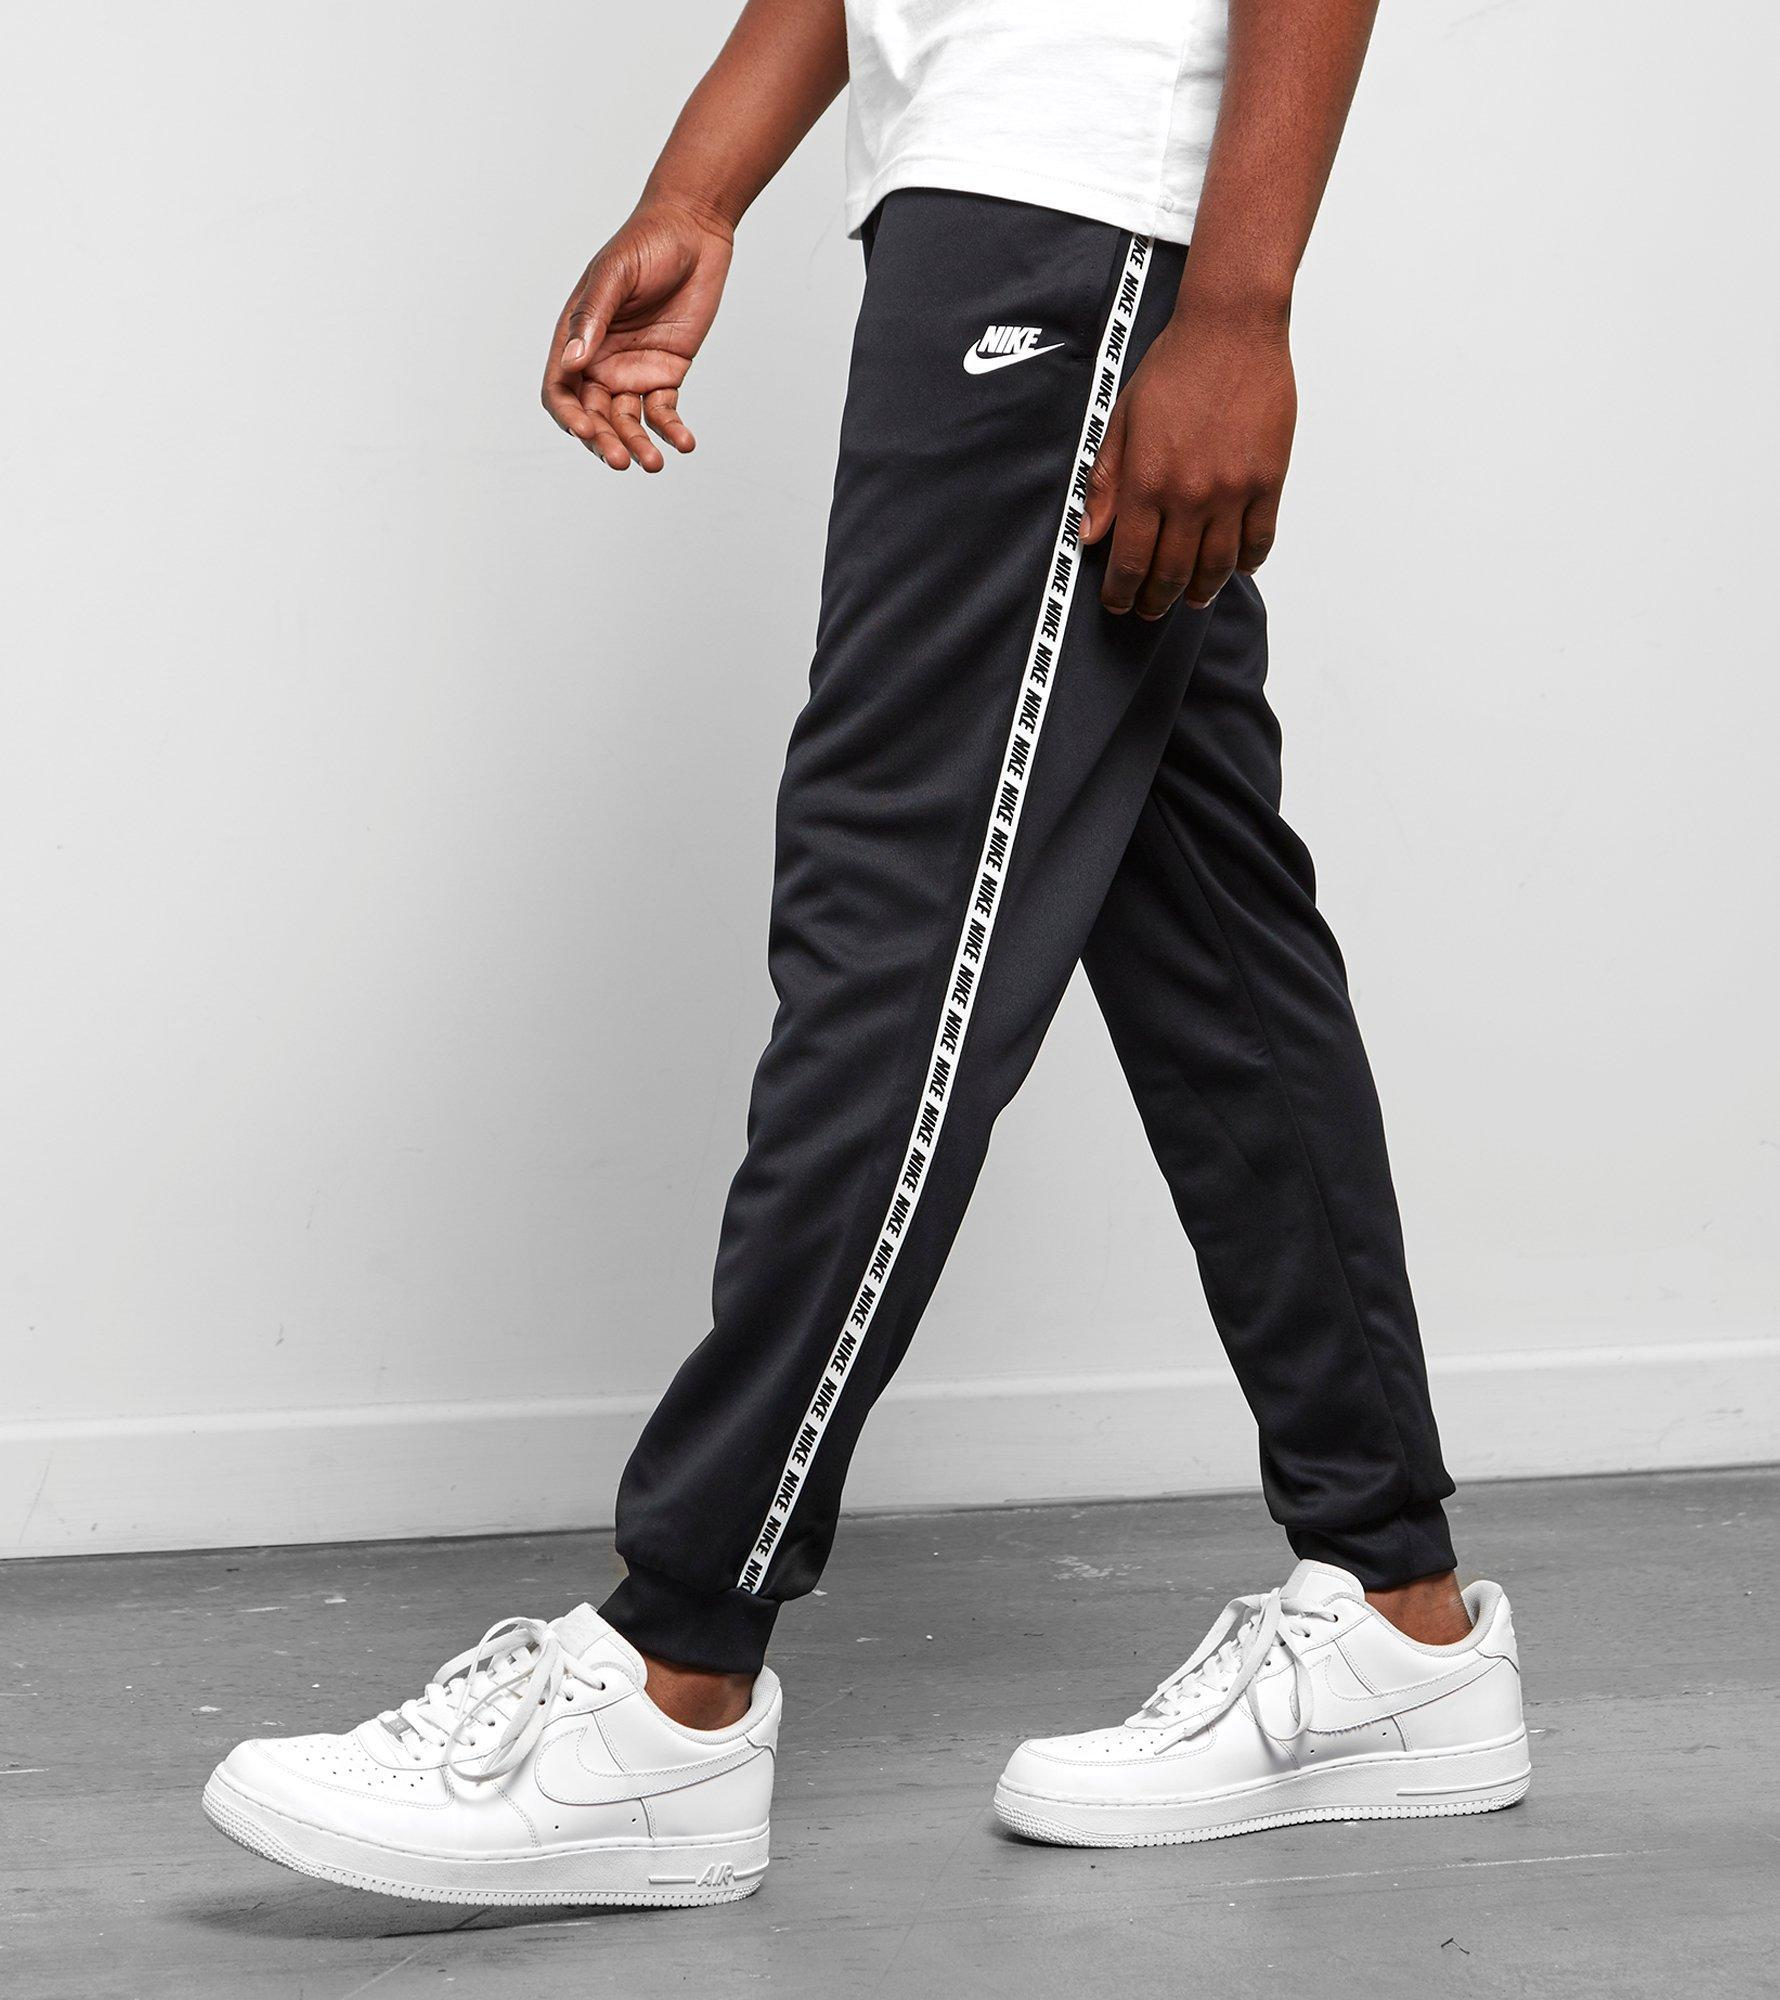 9c590ed49 Nike Gel Tape Cuffed Track Pants in Black for Men - Lyst